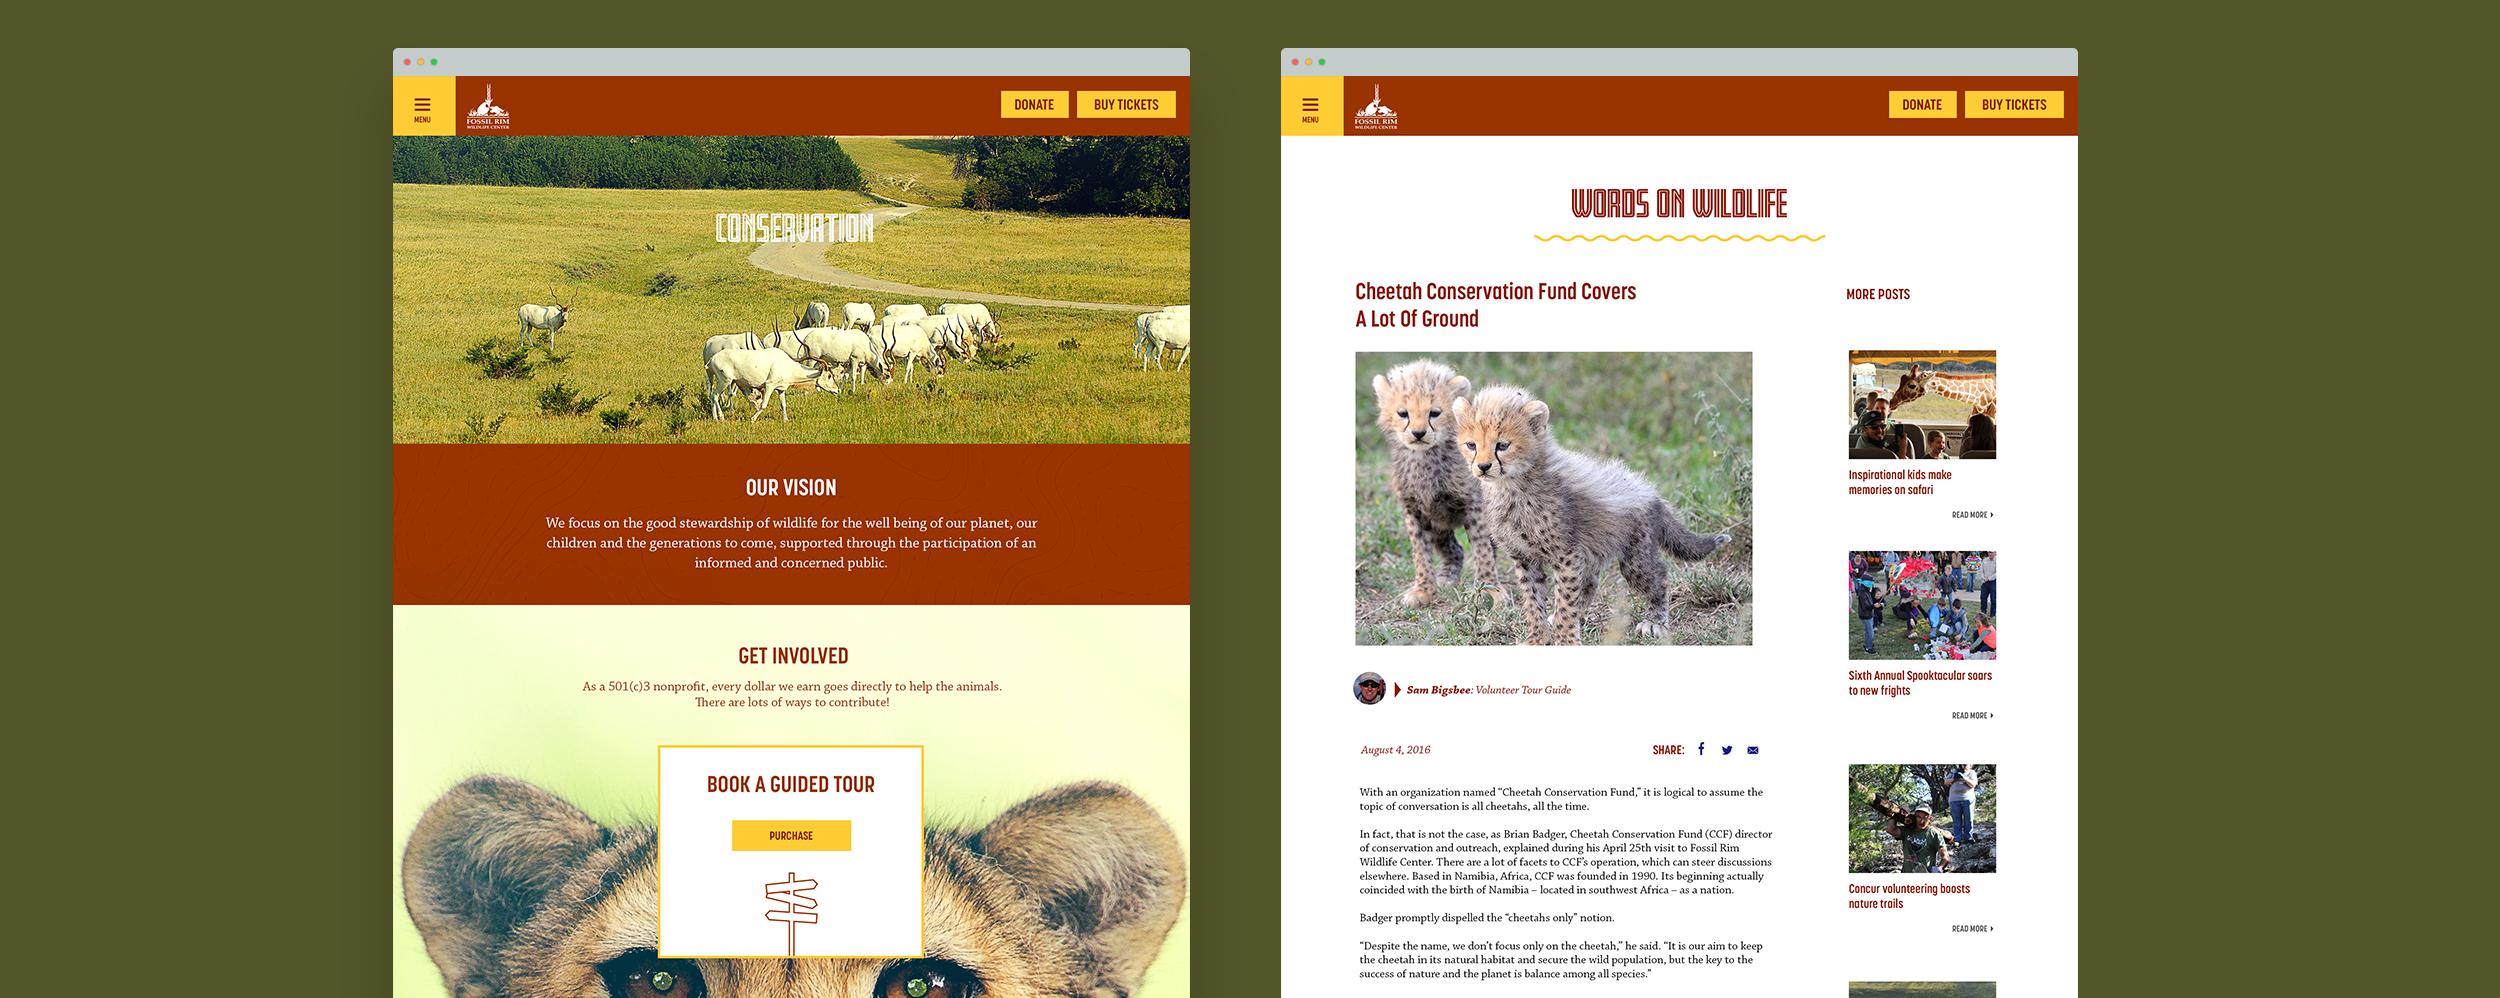 FossilRim_conservation-blog-pages.jpg